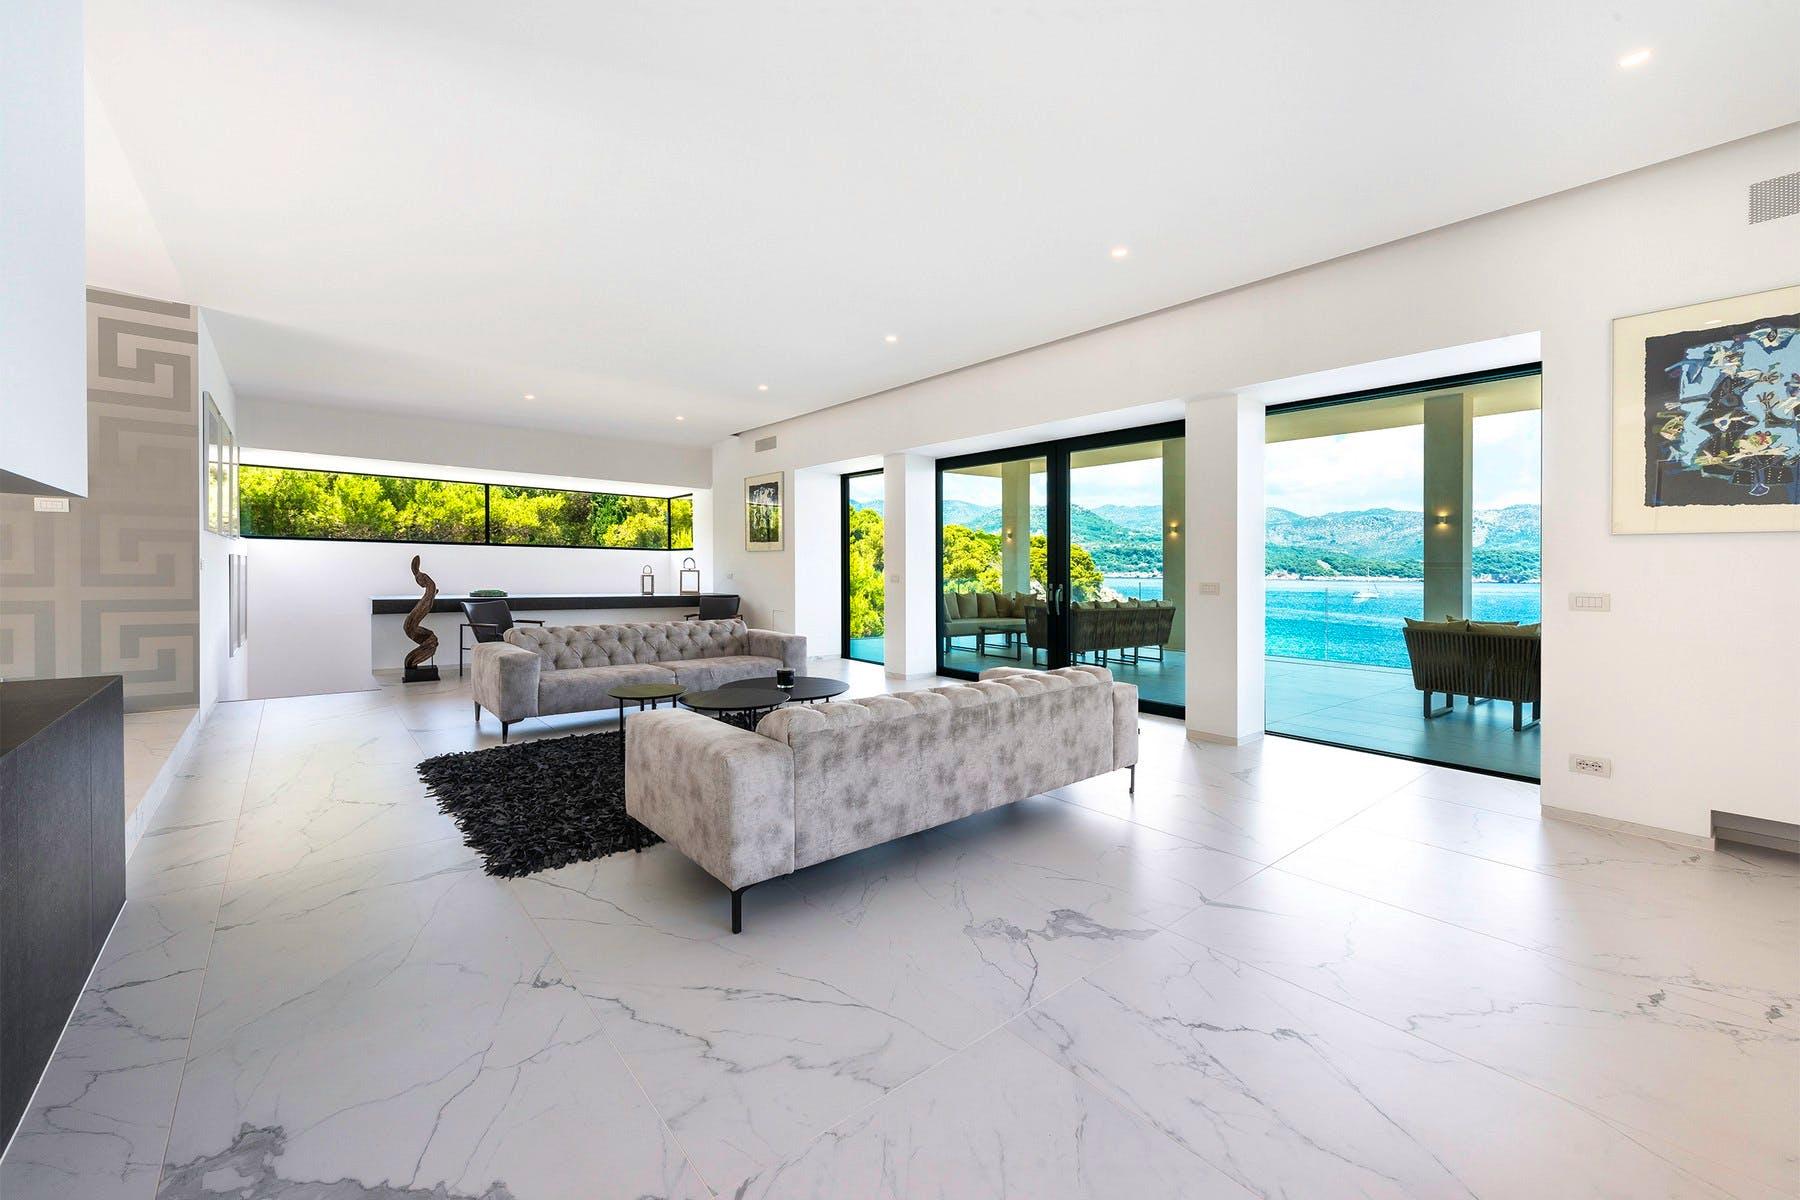 Otvoreni dnevni prostor s pogledom na more